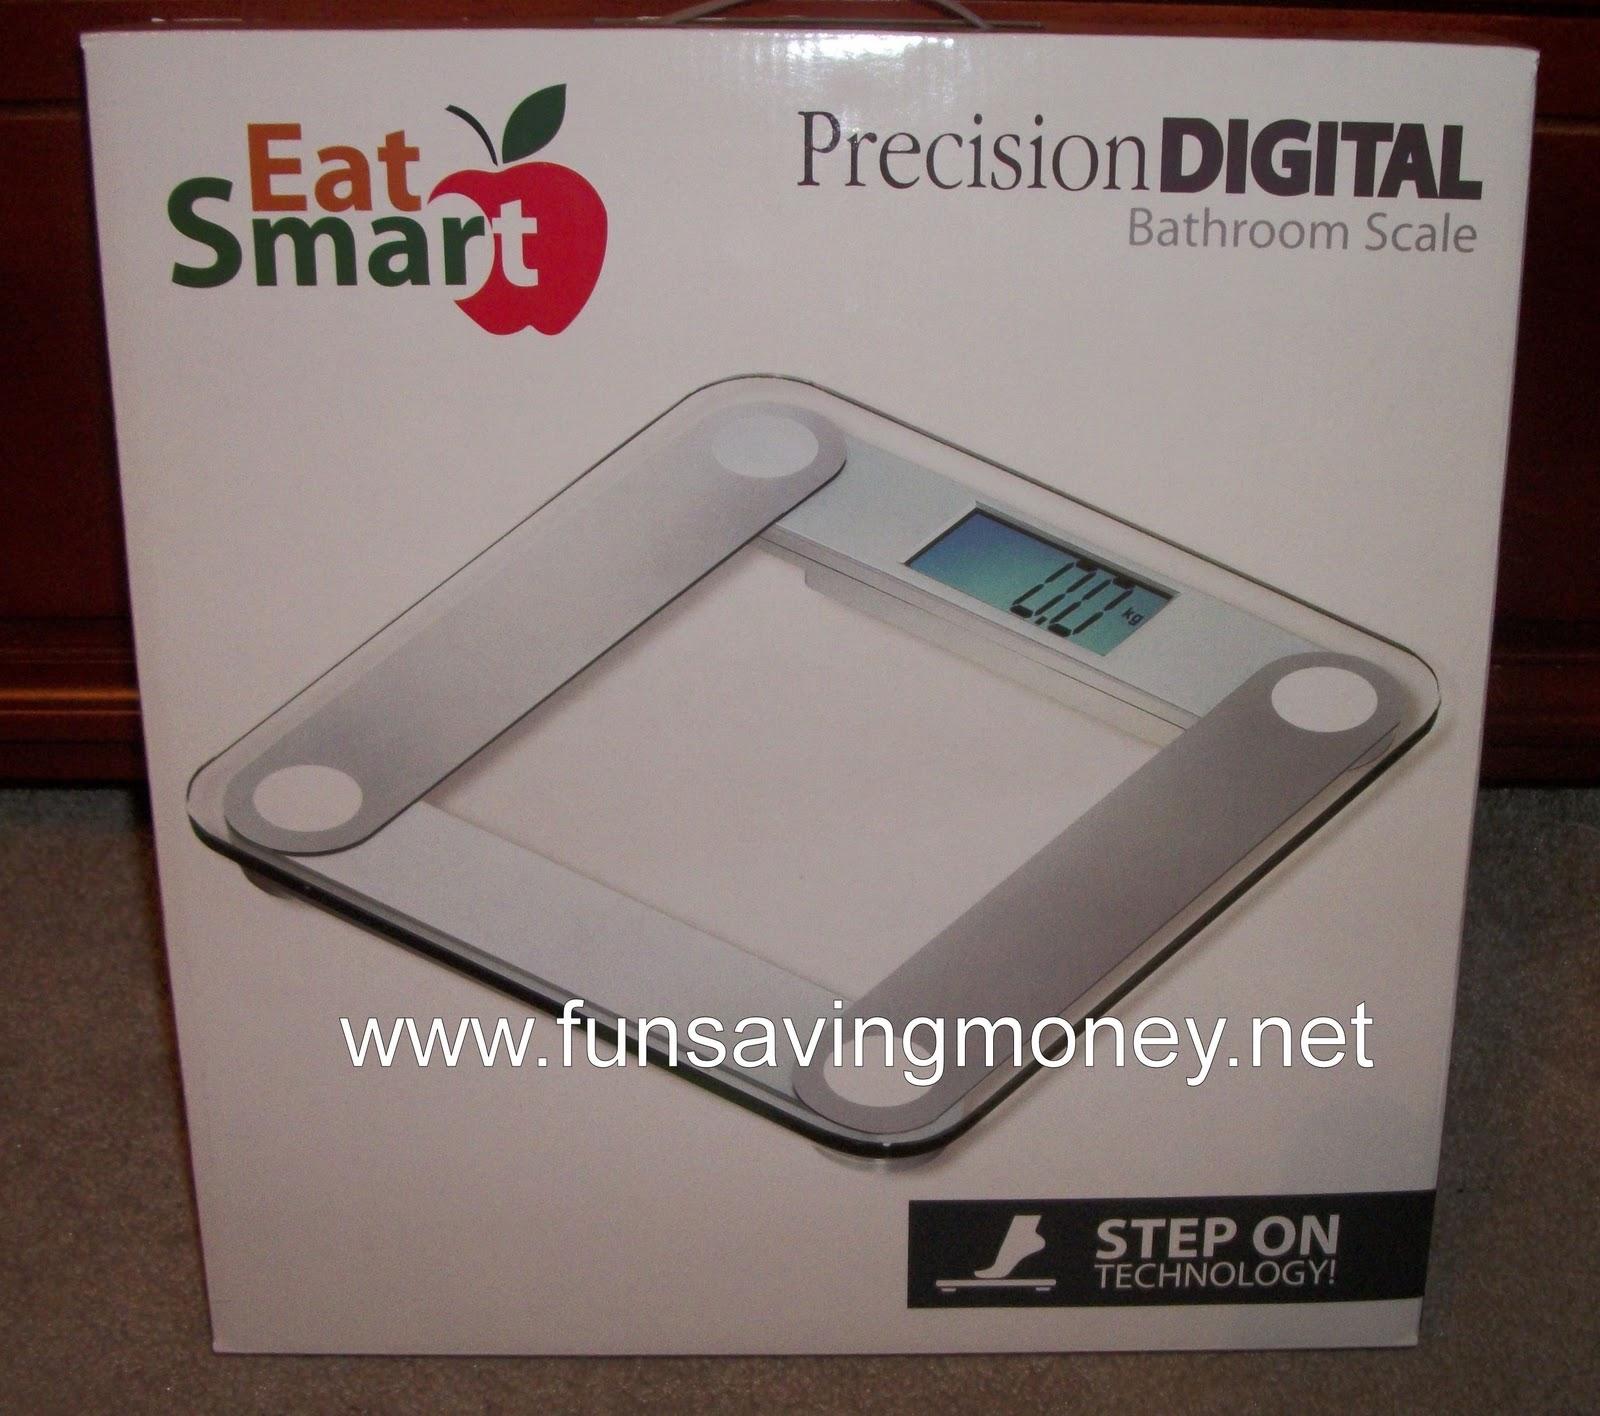 eatsmart digital bathroom scale review and giveaway mom